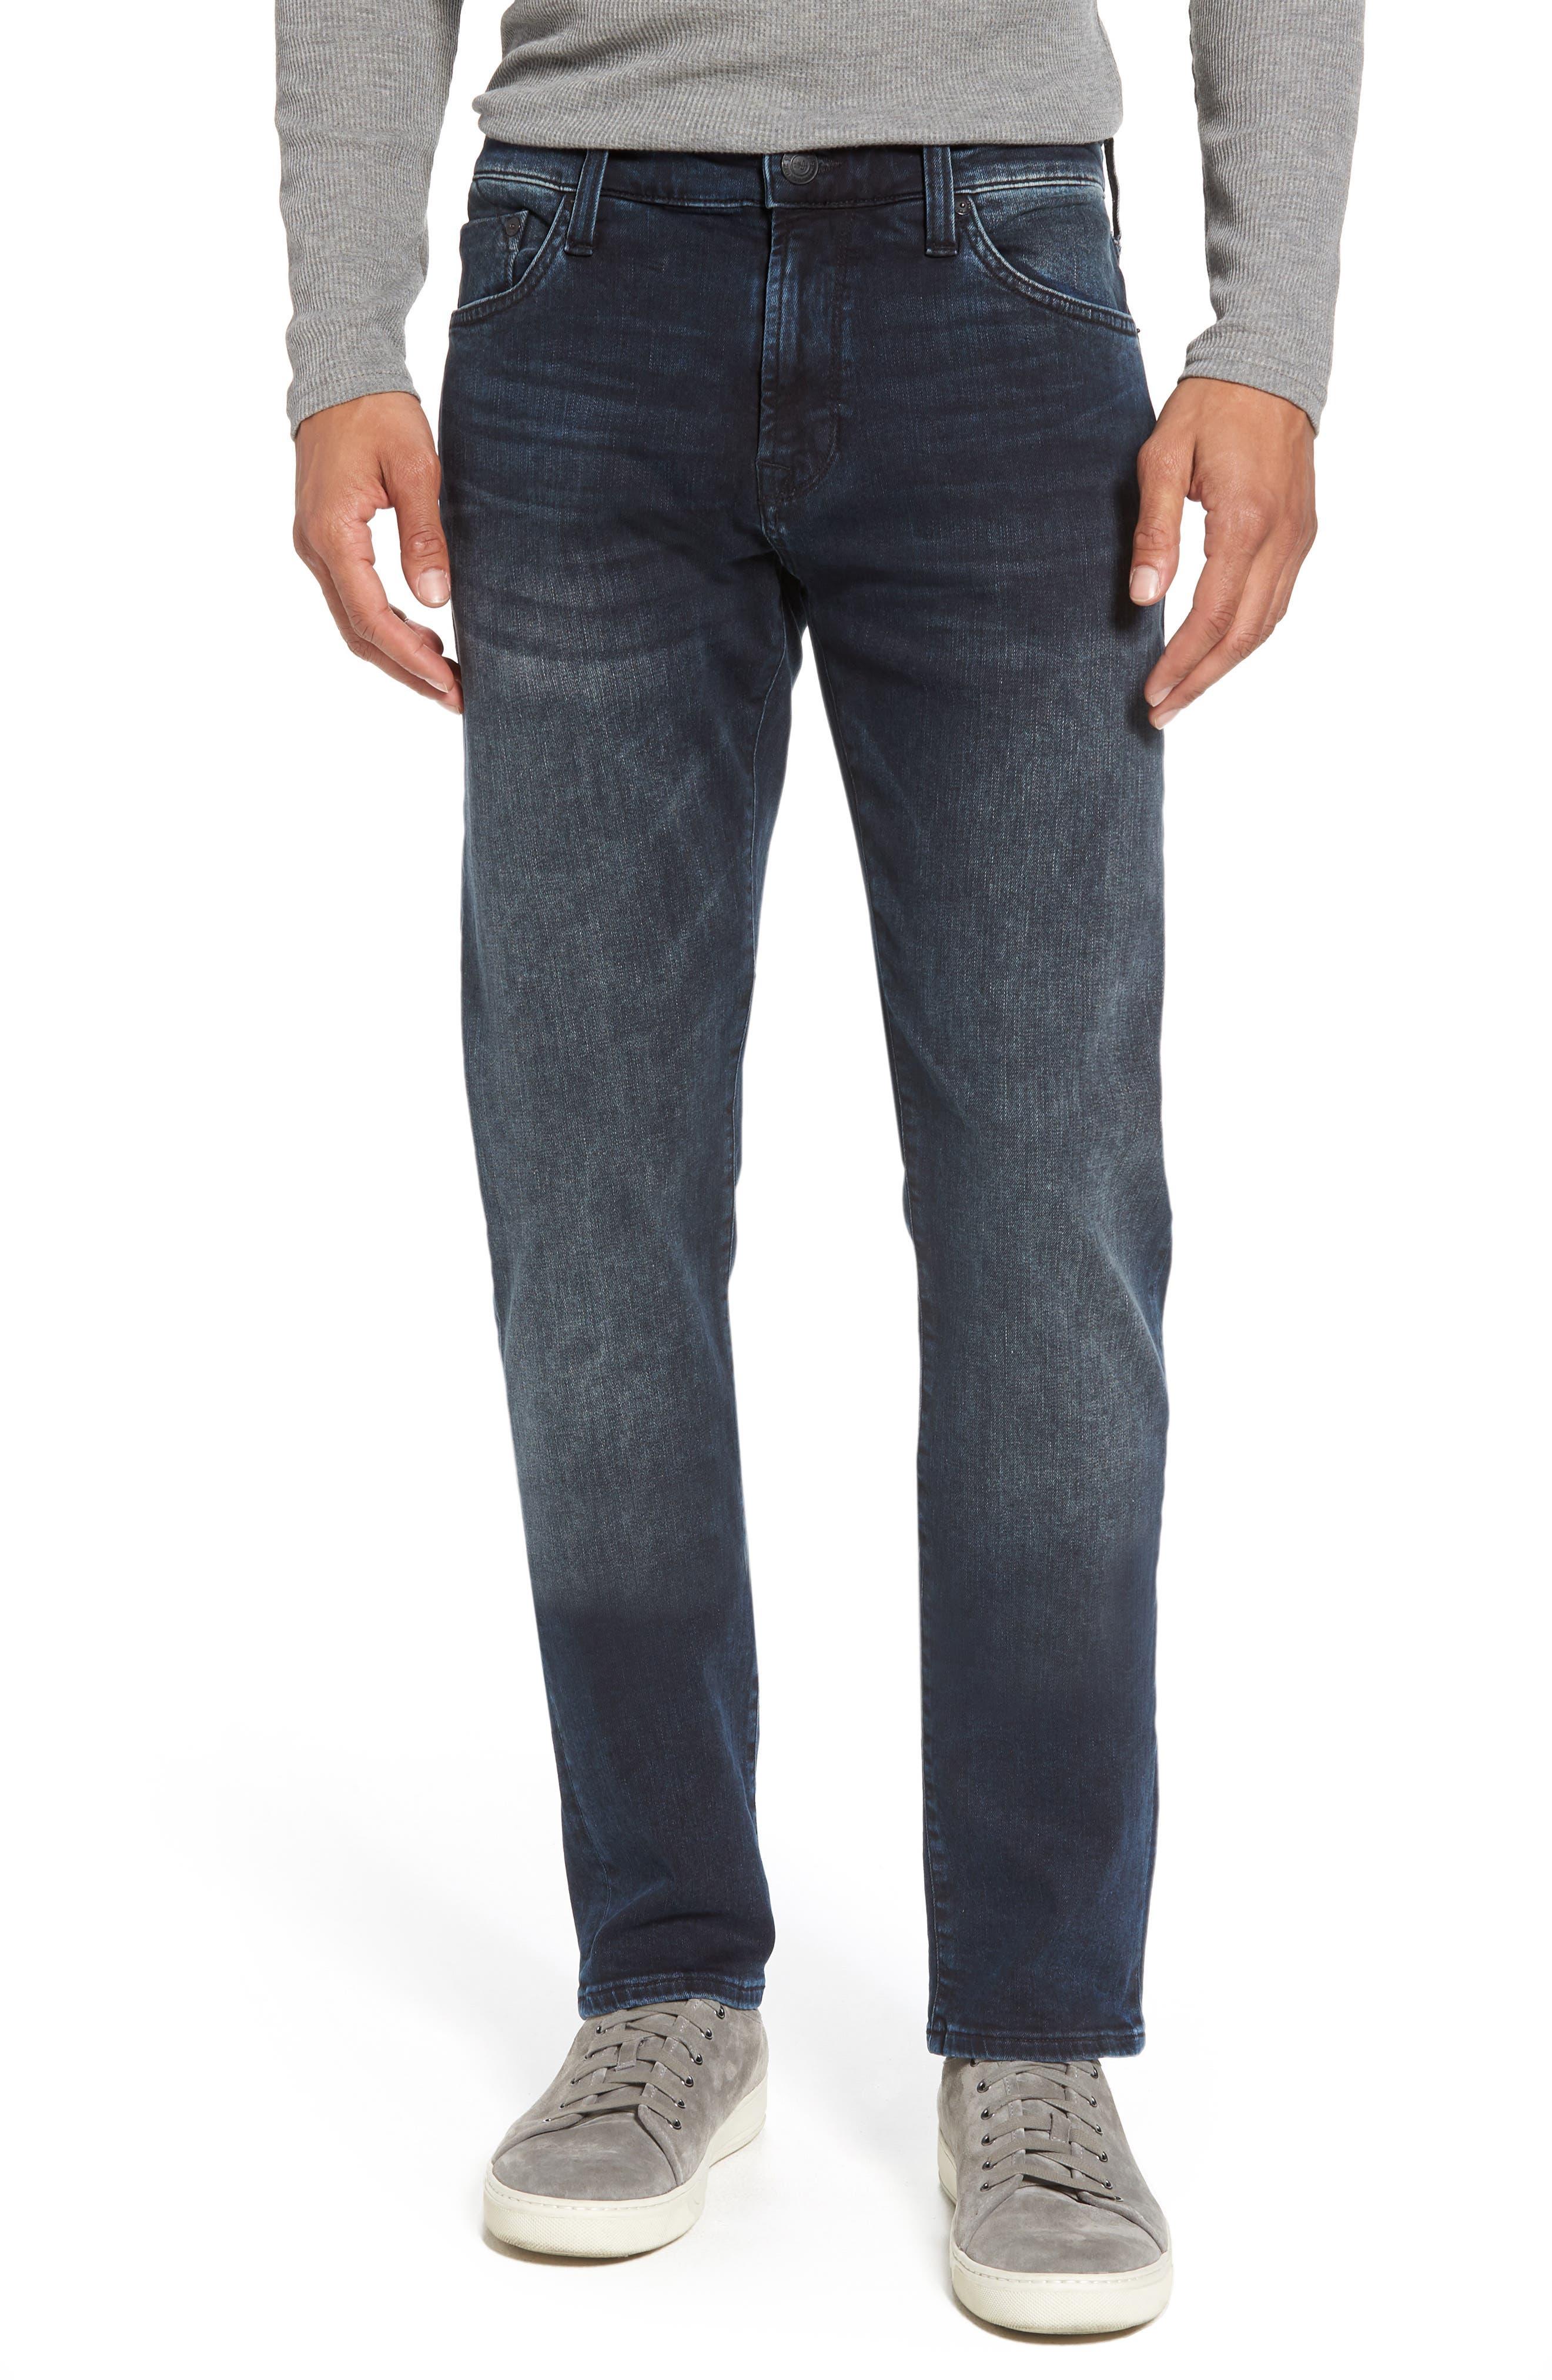 Jake Slim Fit Jeans,                             Main thumbnail 1, color,                             401